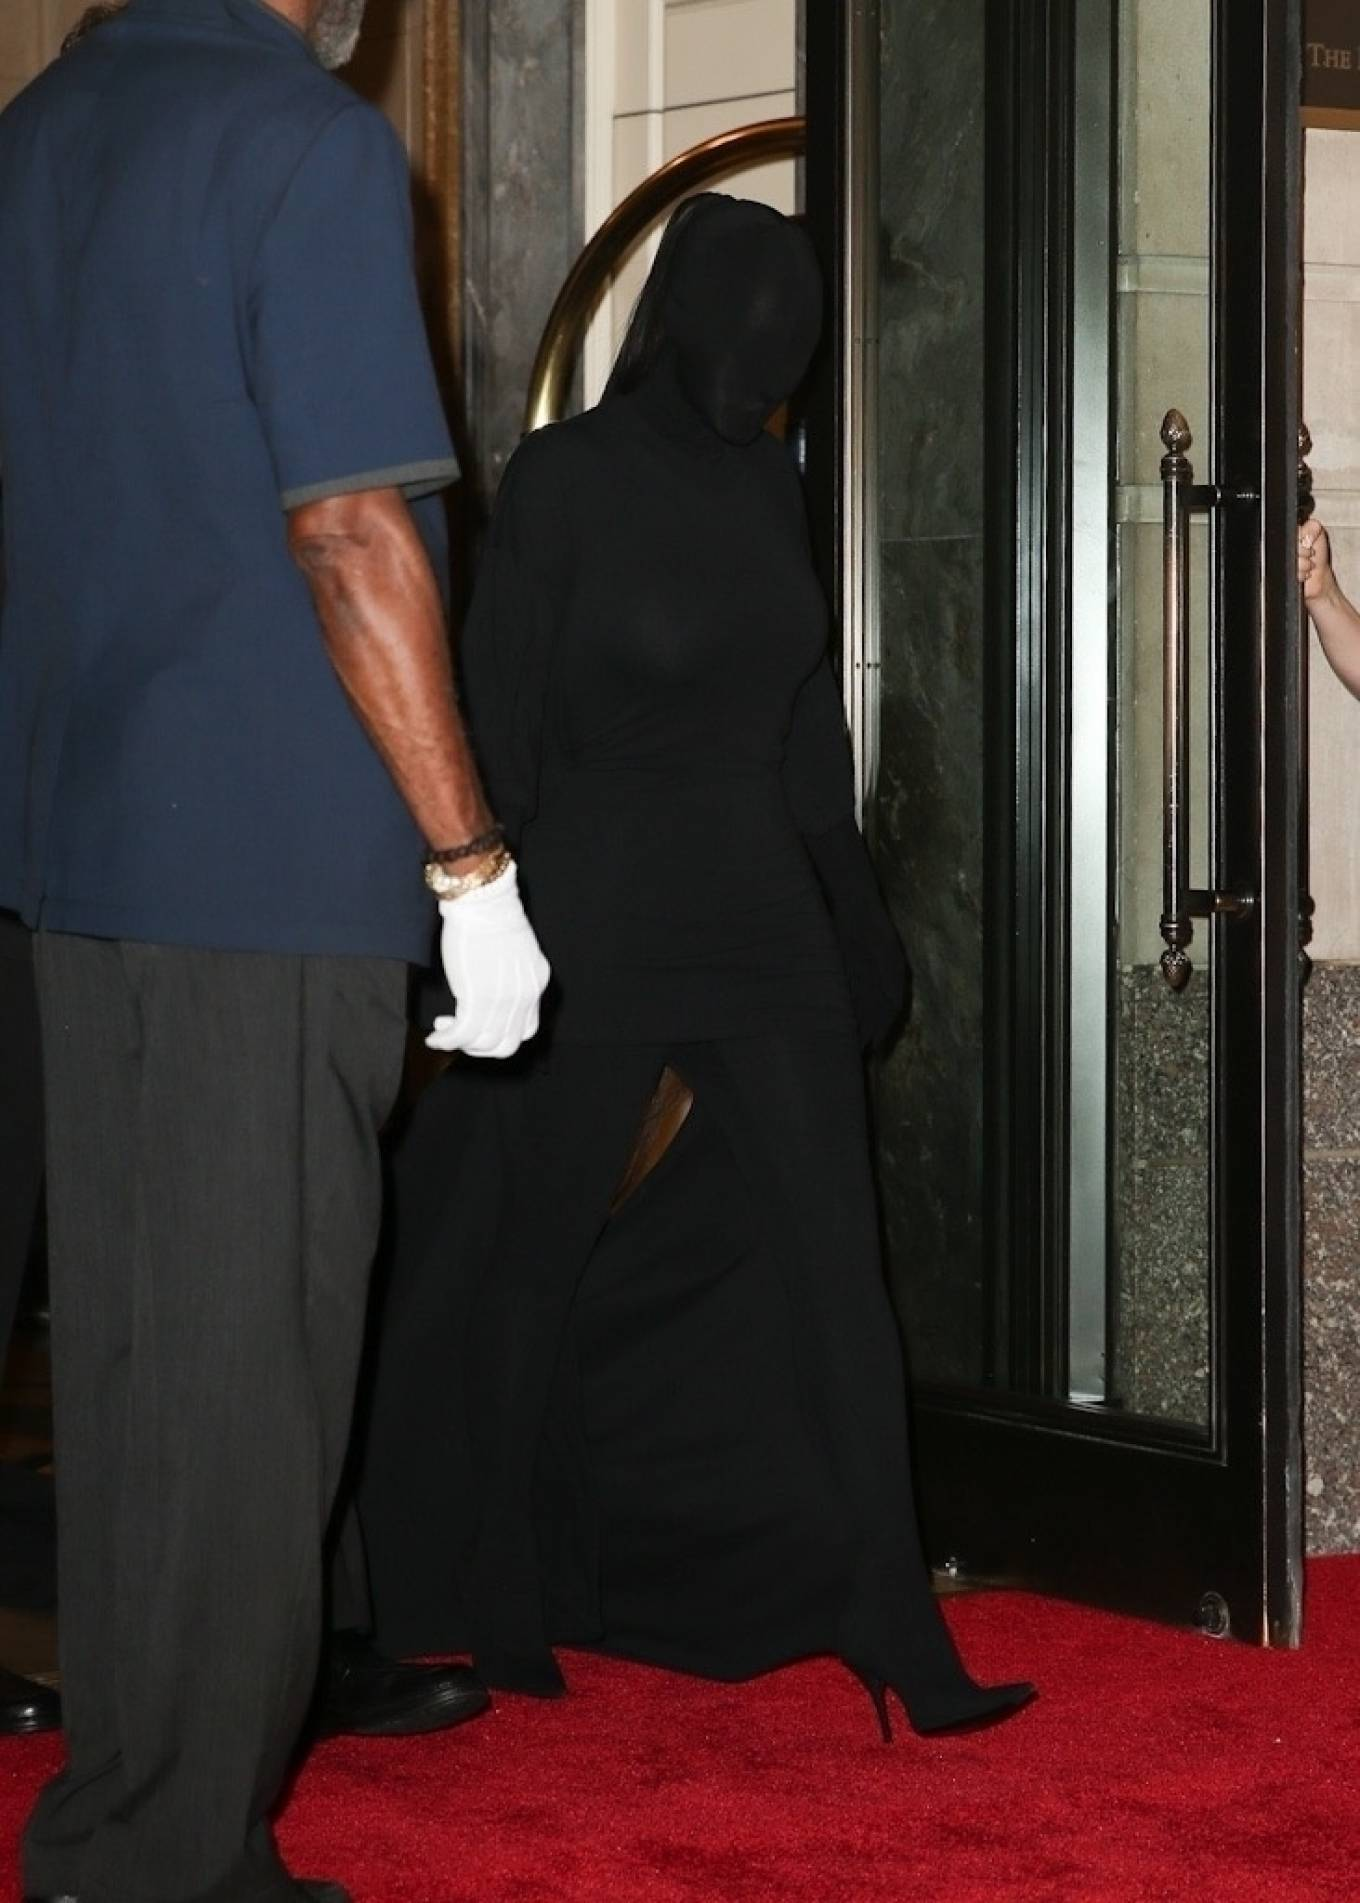 Kim Kardashian 2021 : Kim Kardashian – Seen while exits The Ritz-Carlton hotel ahead of the Met Gala in New York-10